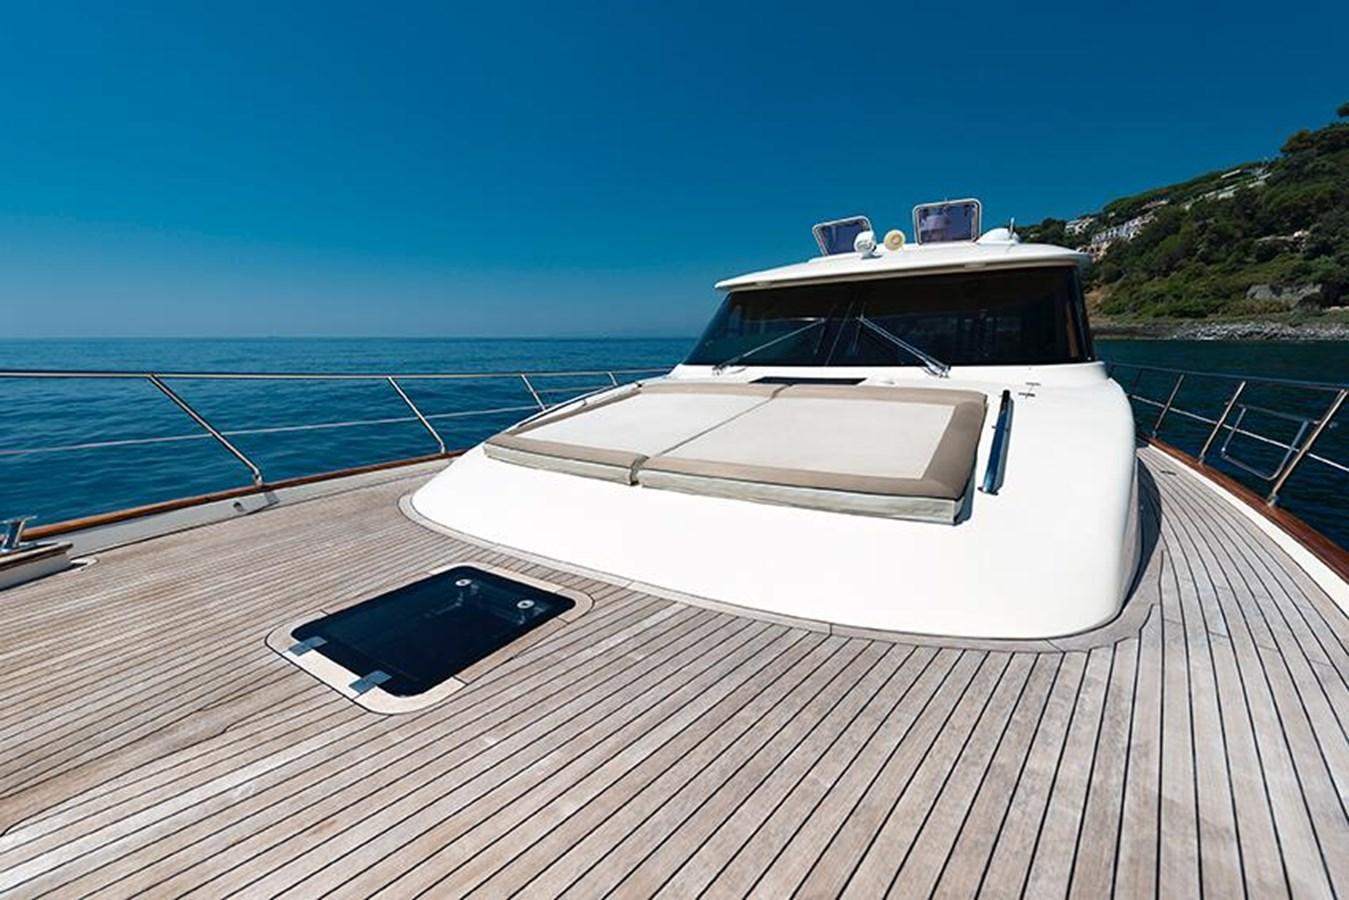 IMG-20200304-WA0003 2011 ABATI YACHTS kEYPORT 60 Motor Yacht 2879763